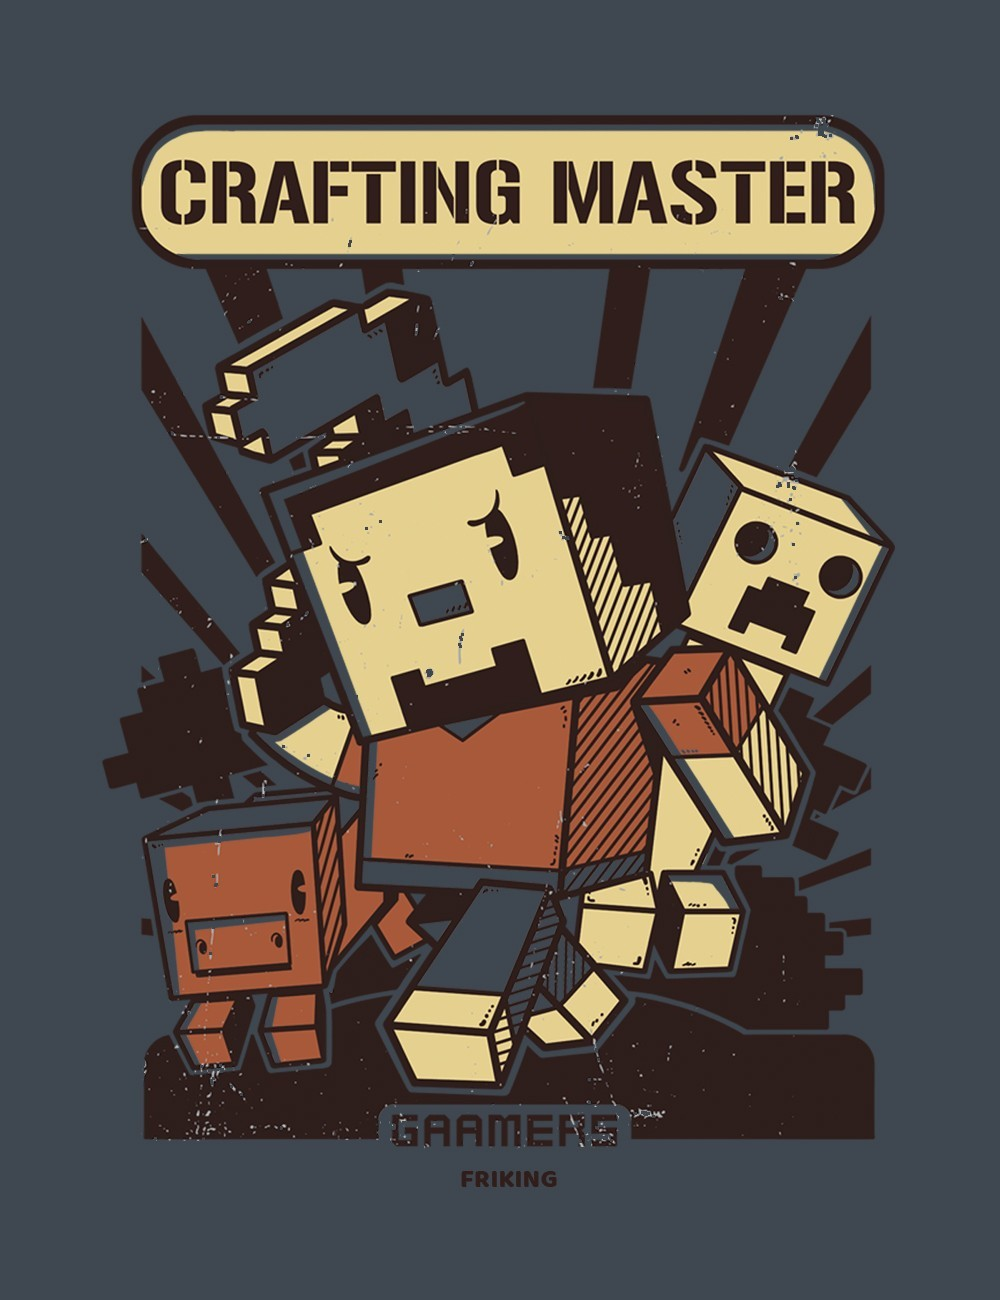 Crafting Master